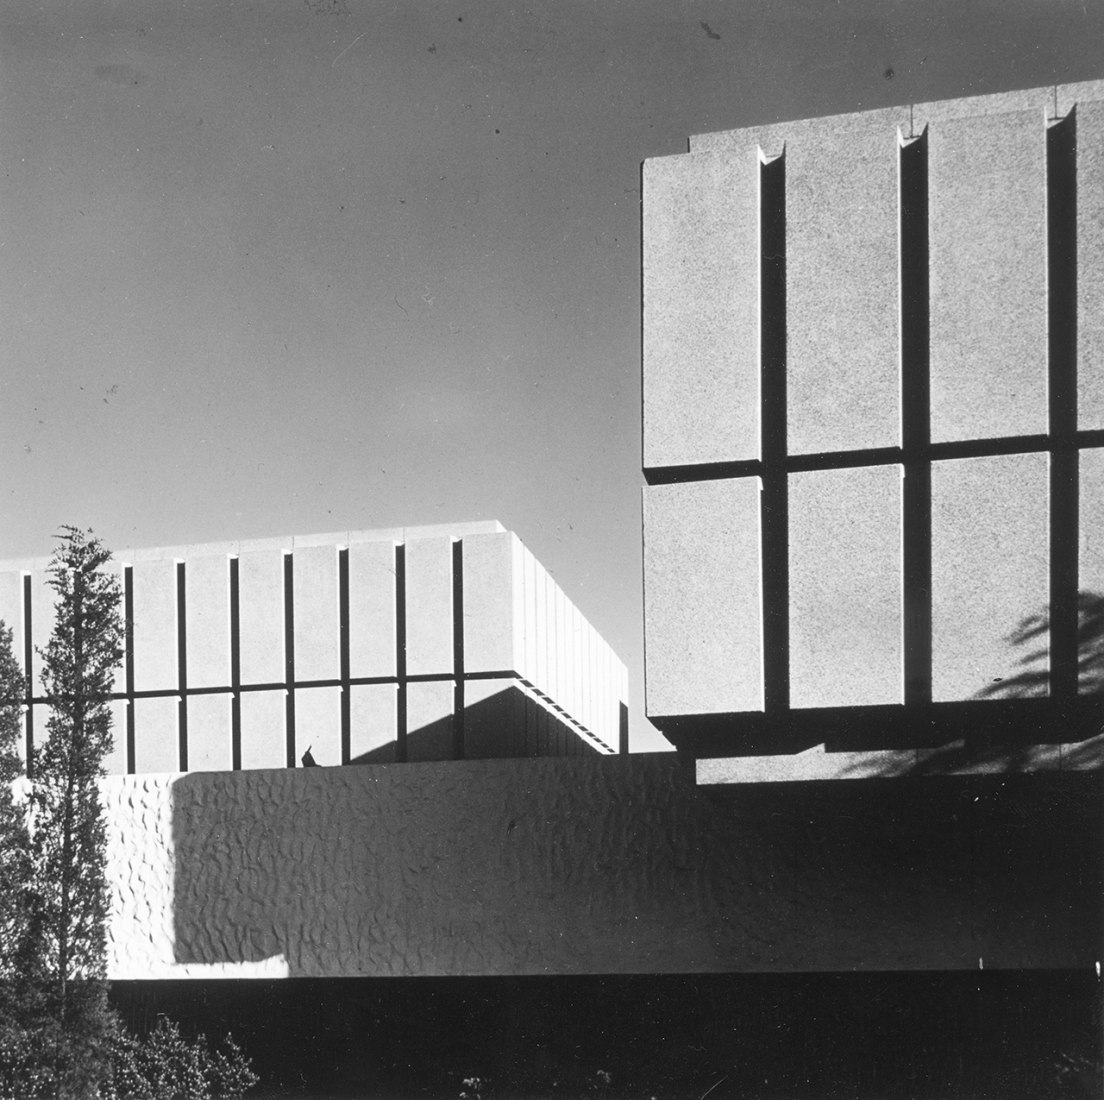 Detail, Spanish Pavilion, 1964/65 New York World's Fair. Image courtesy of Loewe.